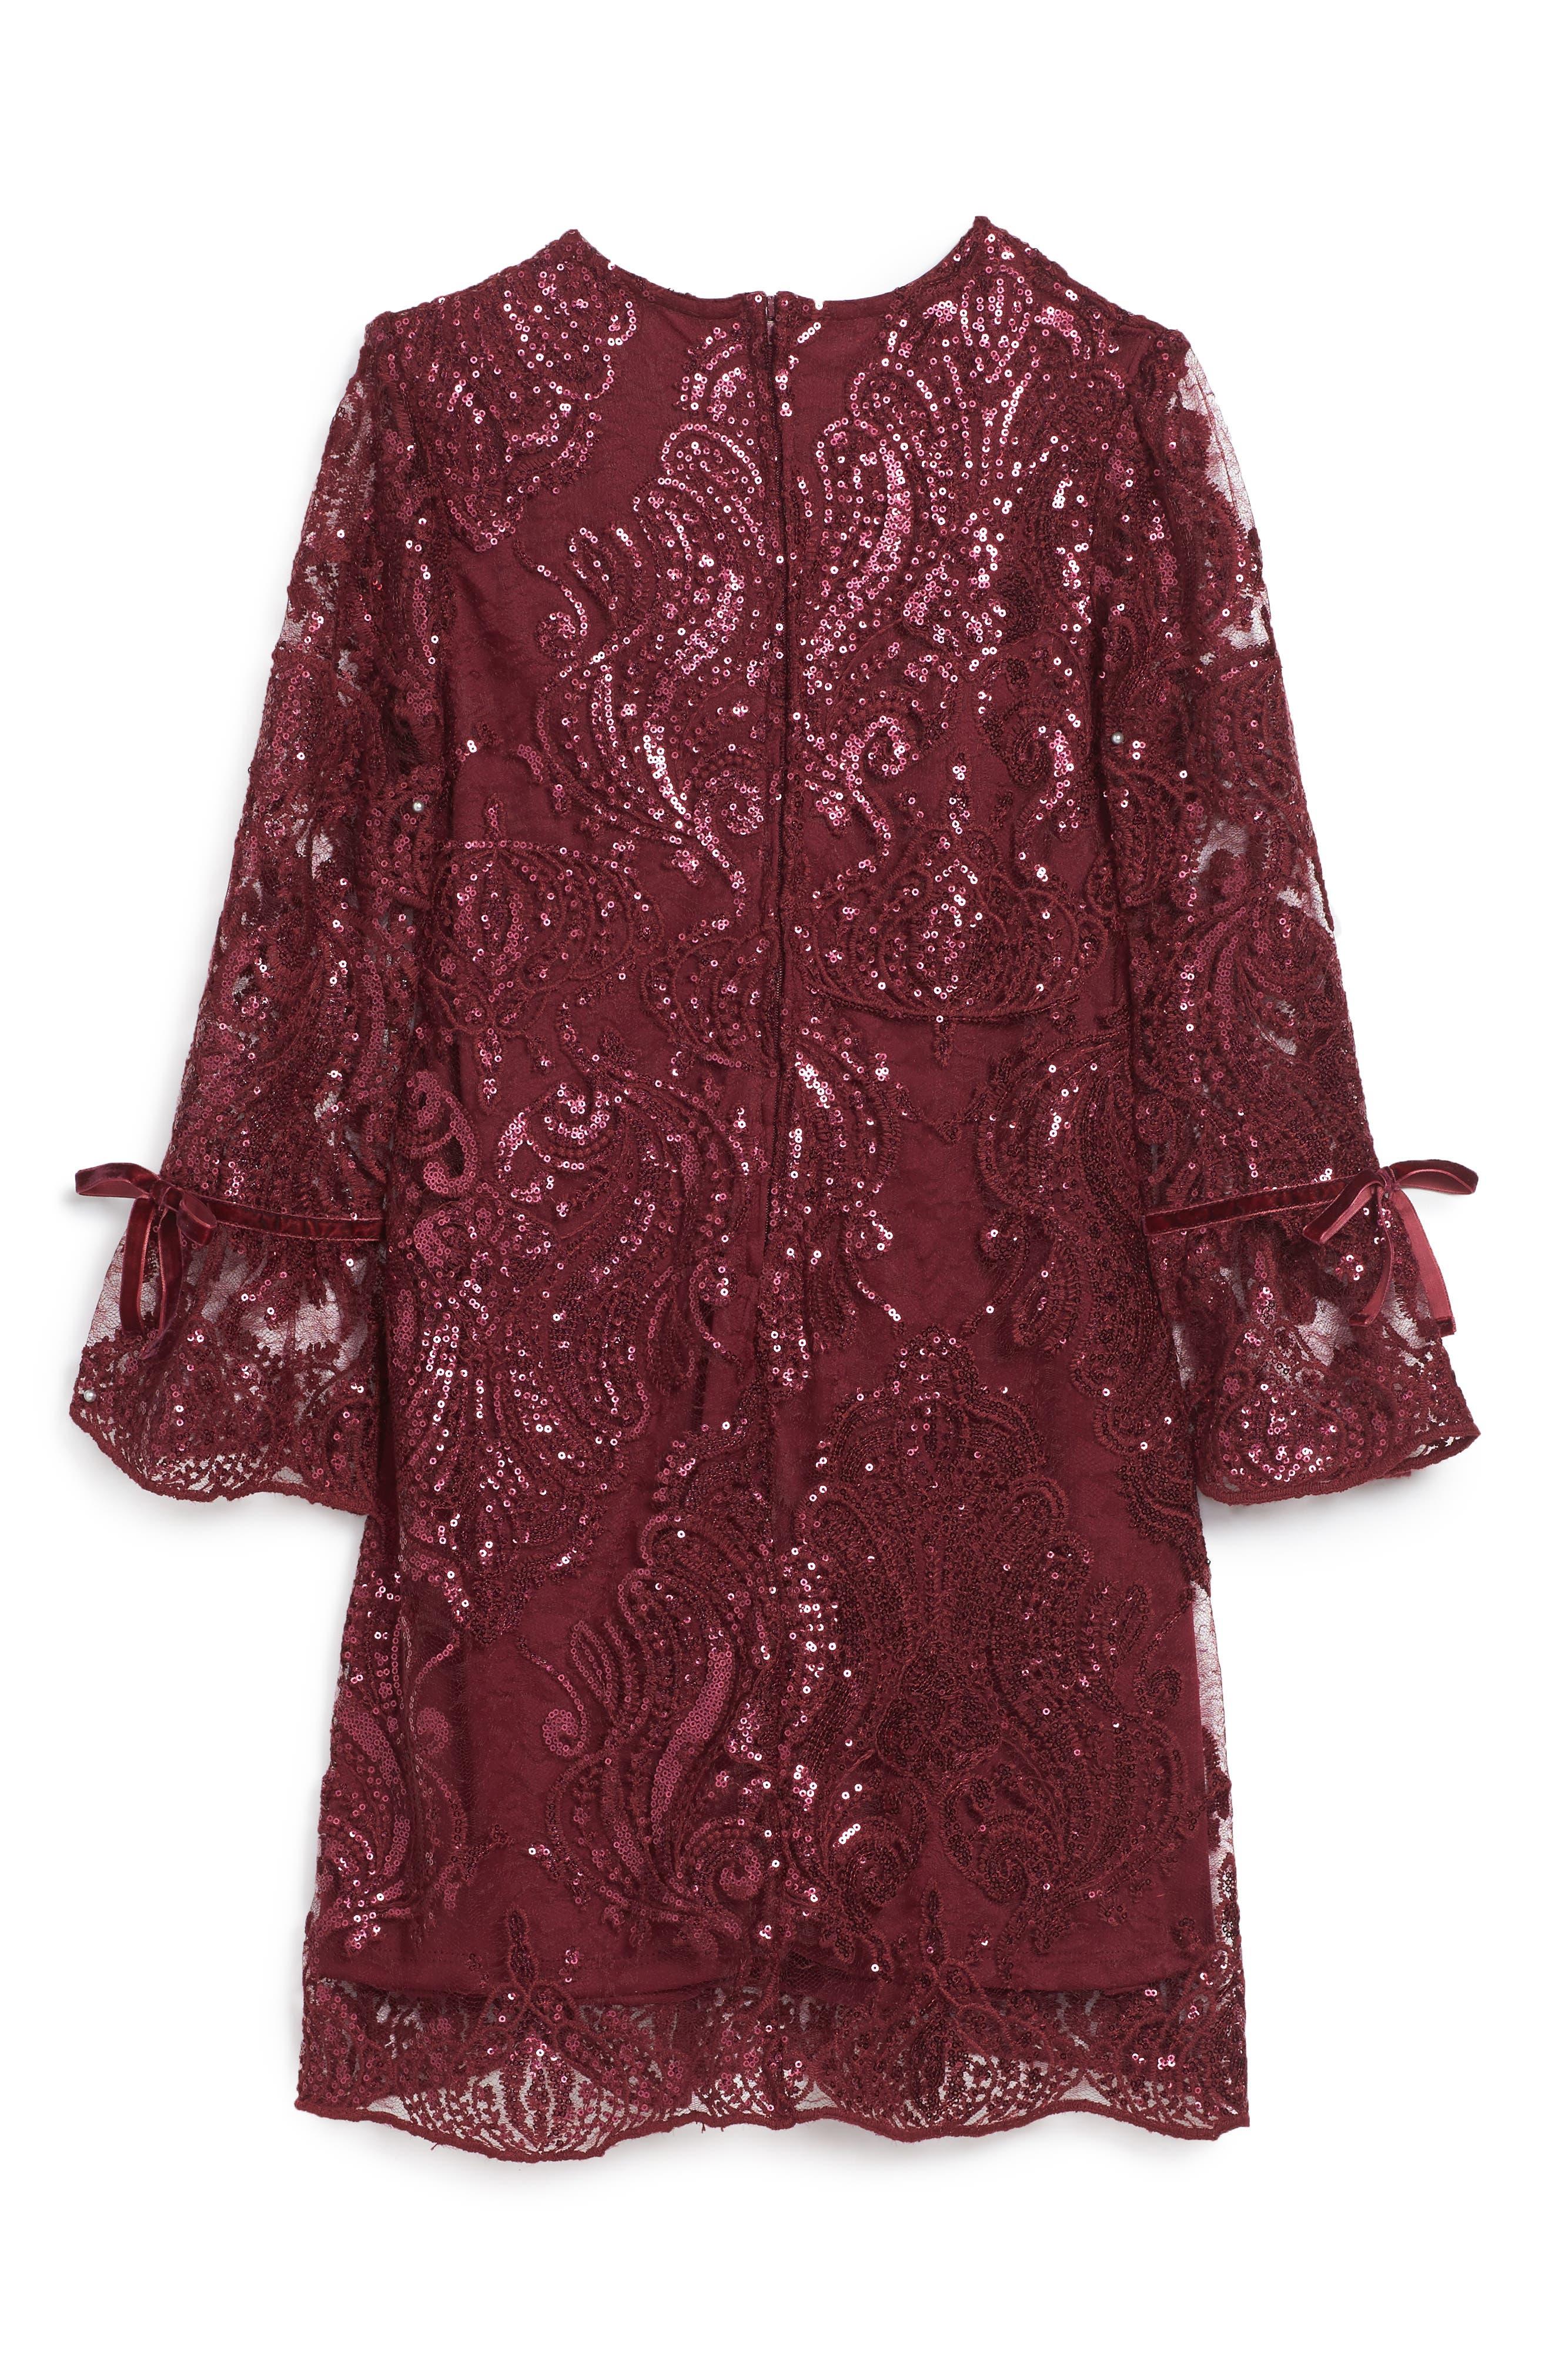 Scalloped Sequin Embellished Shift Dress,                             Alternate thumbnail 2, color,                             600